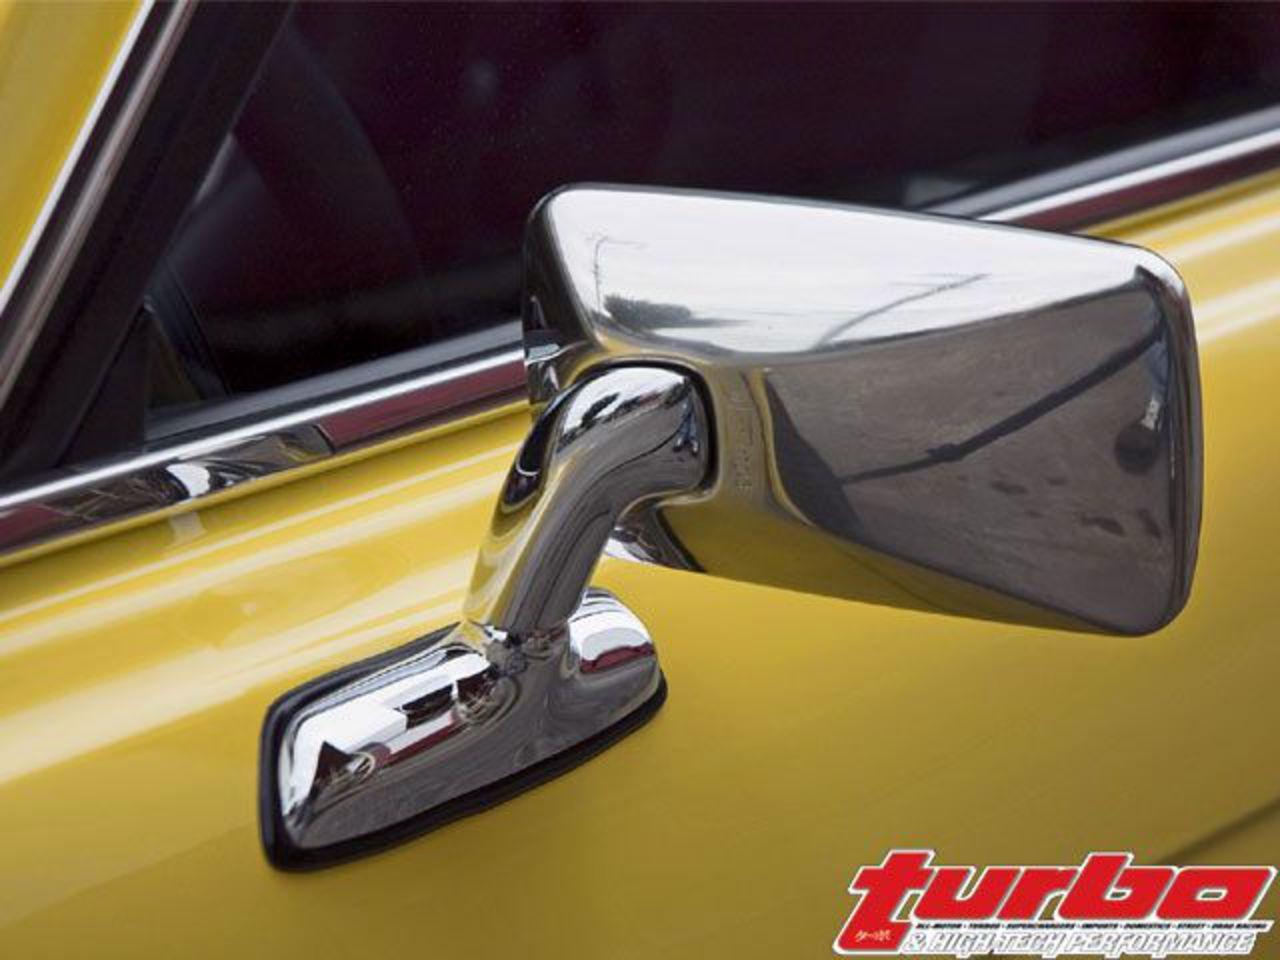 TopWorldAuto >> Photos of Datsun 510 2-dr Sedan - photo galleries